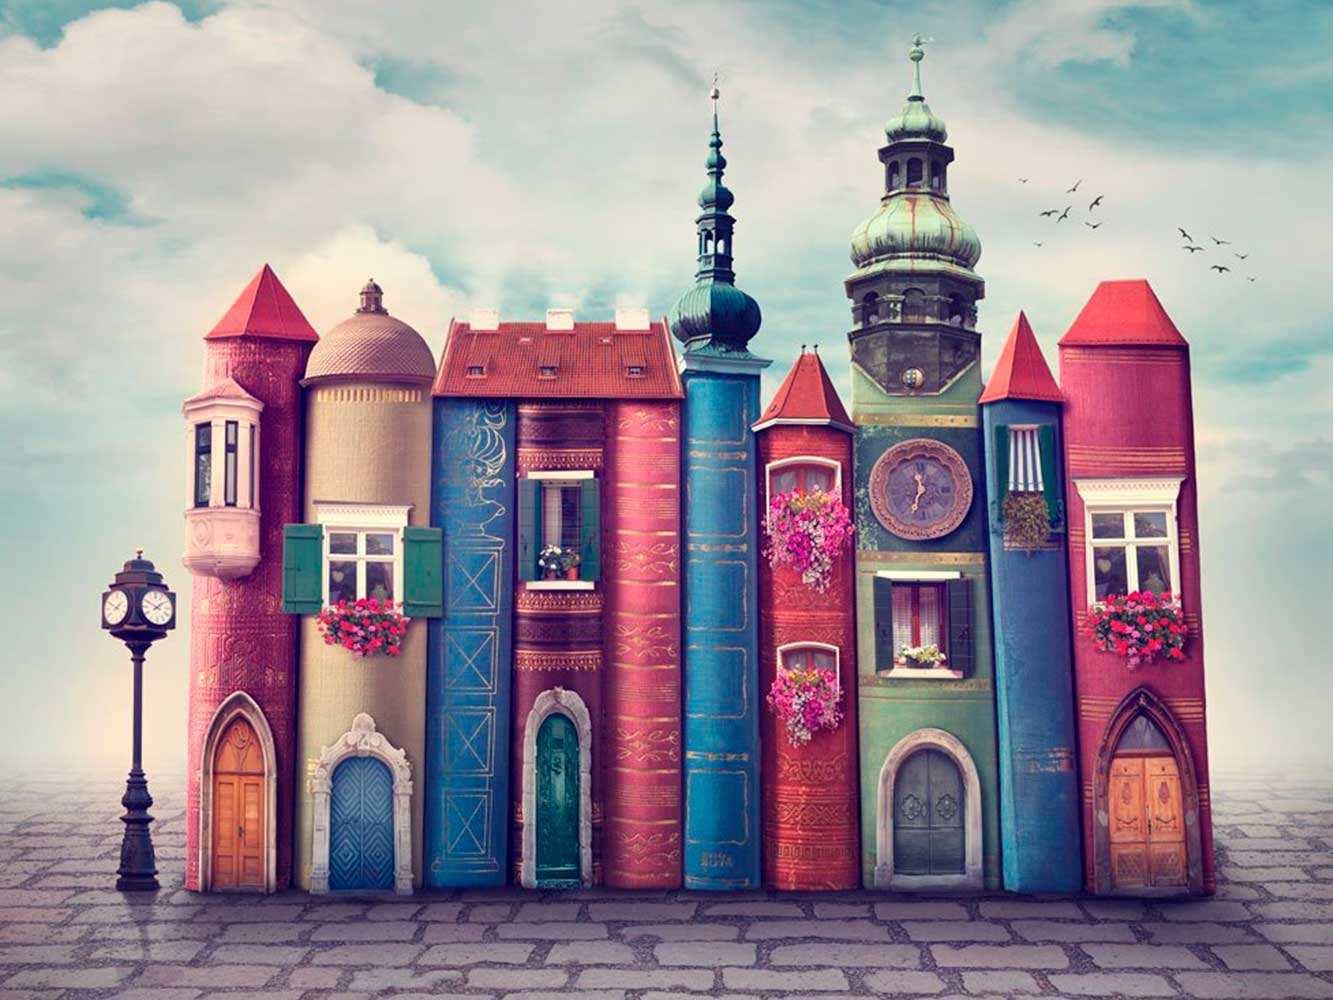 fondo-fotografico-arte-casas-libros-diseno